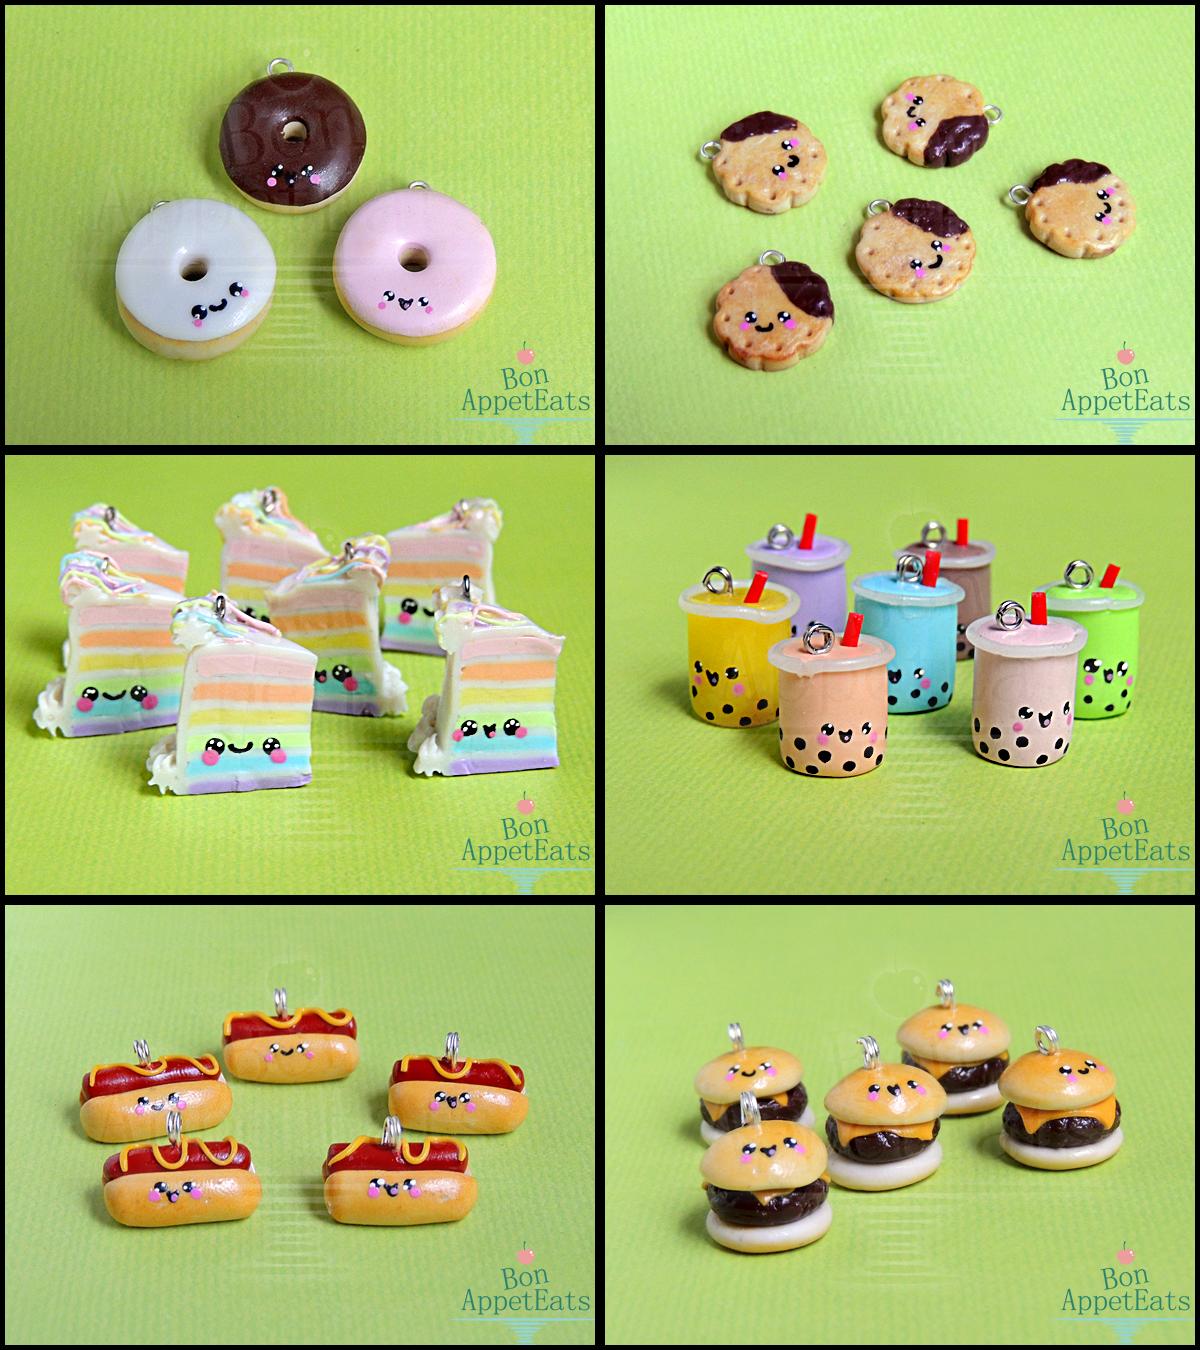 AnimateMiami Cute Food, Set 2 by Bon-AppetEats